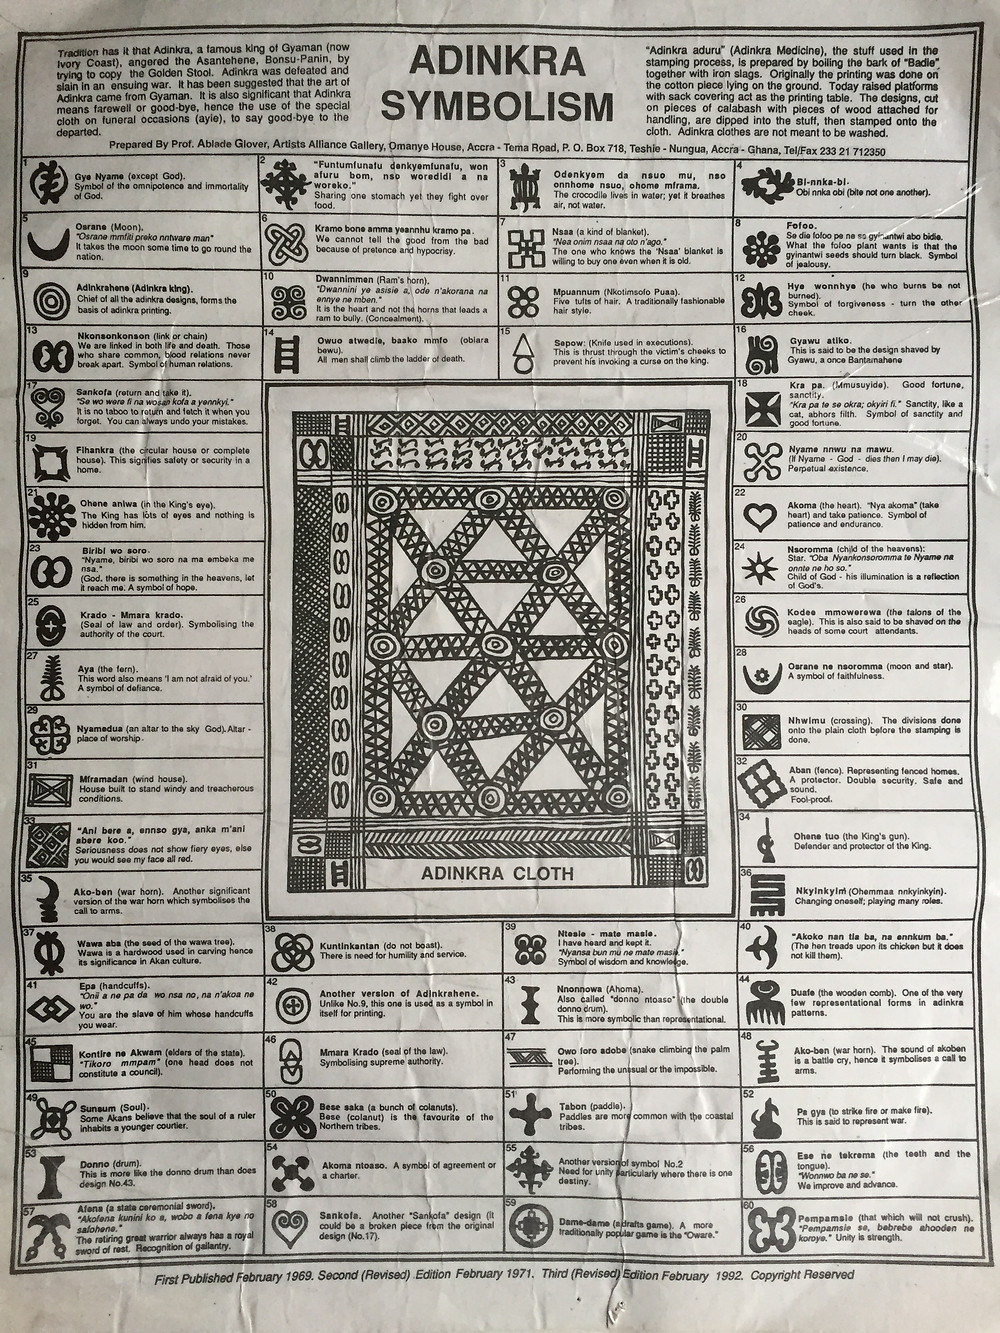 Adinkra Symbolism Chart